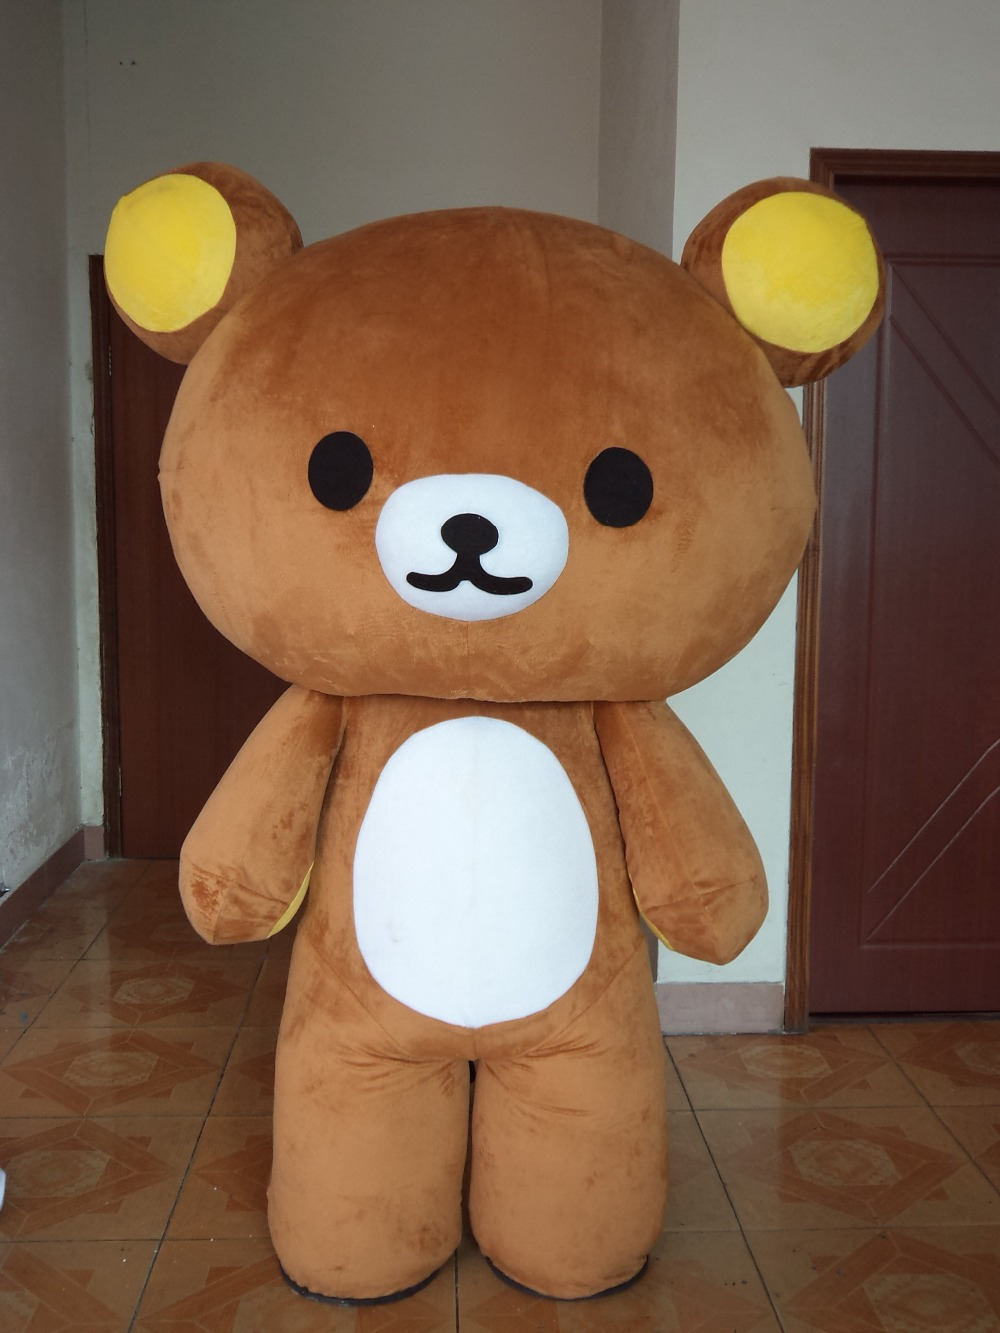 Assassino        Relaxation-teddy-bear-mascot-costume-apparel